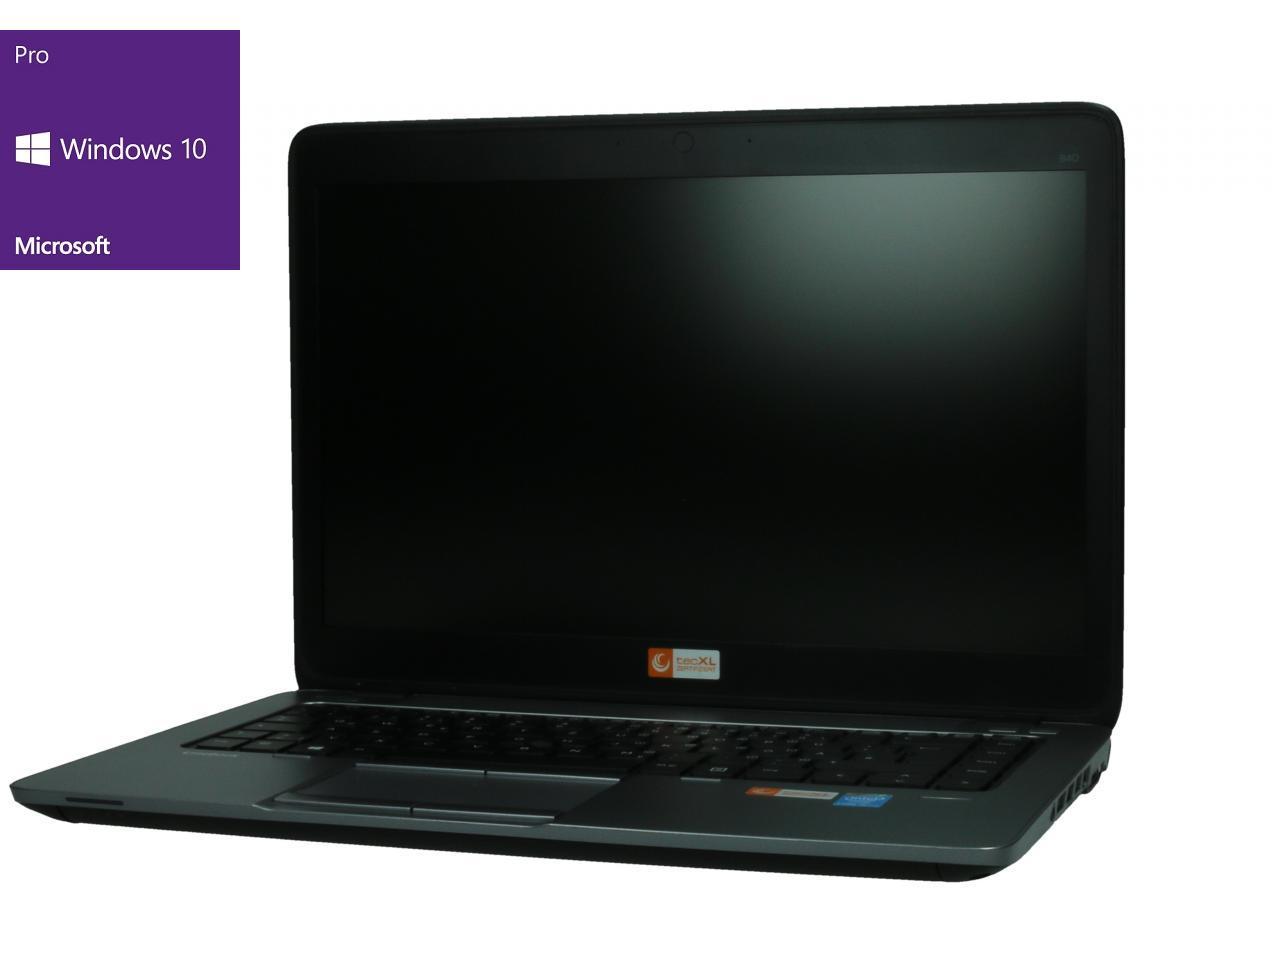 Hewlett Packard EliteBook 840 G1